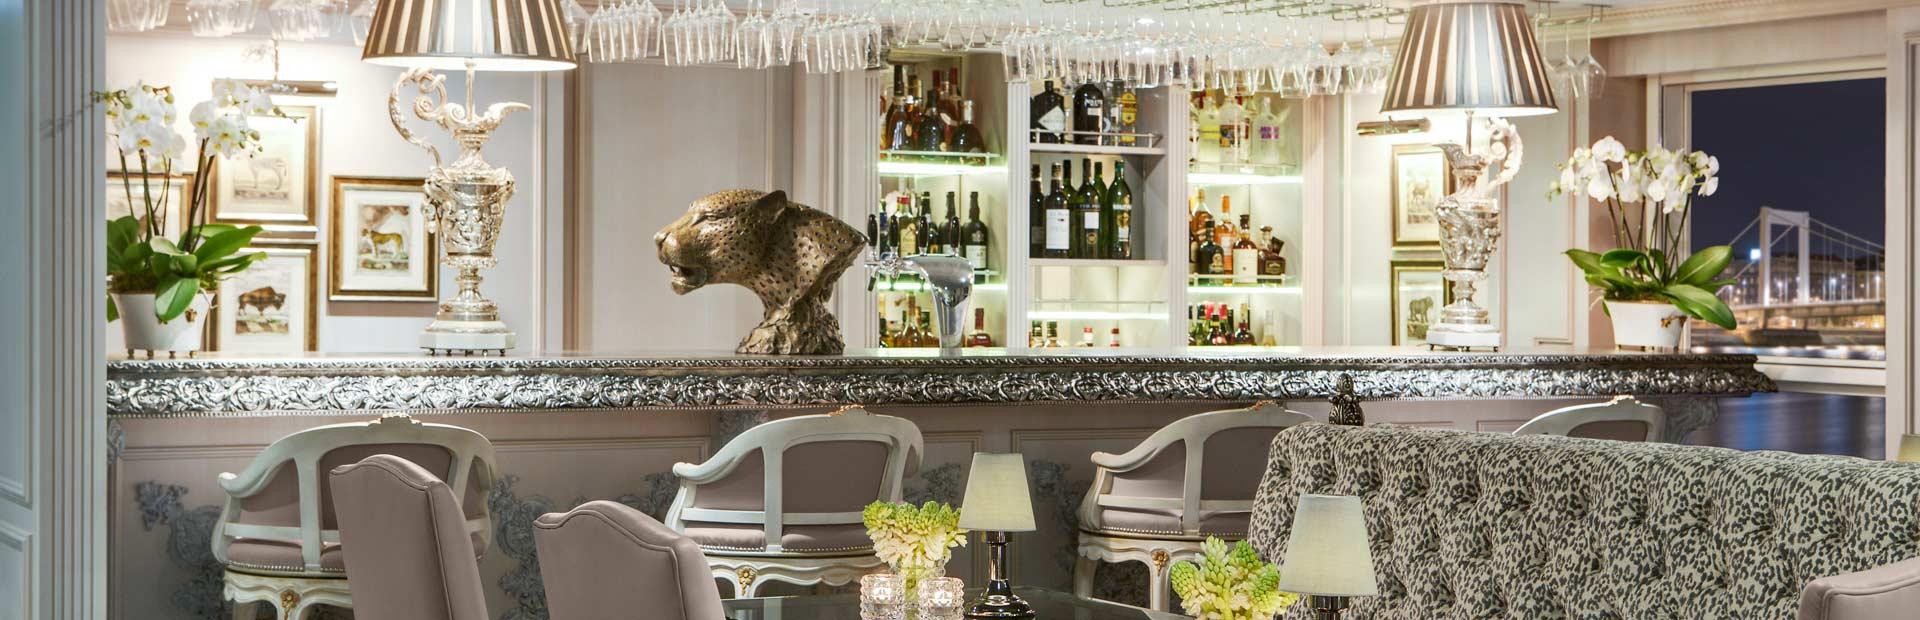 Uniworld SS Maria Theresa Leopard Lounge